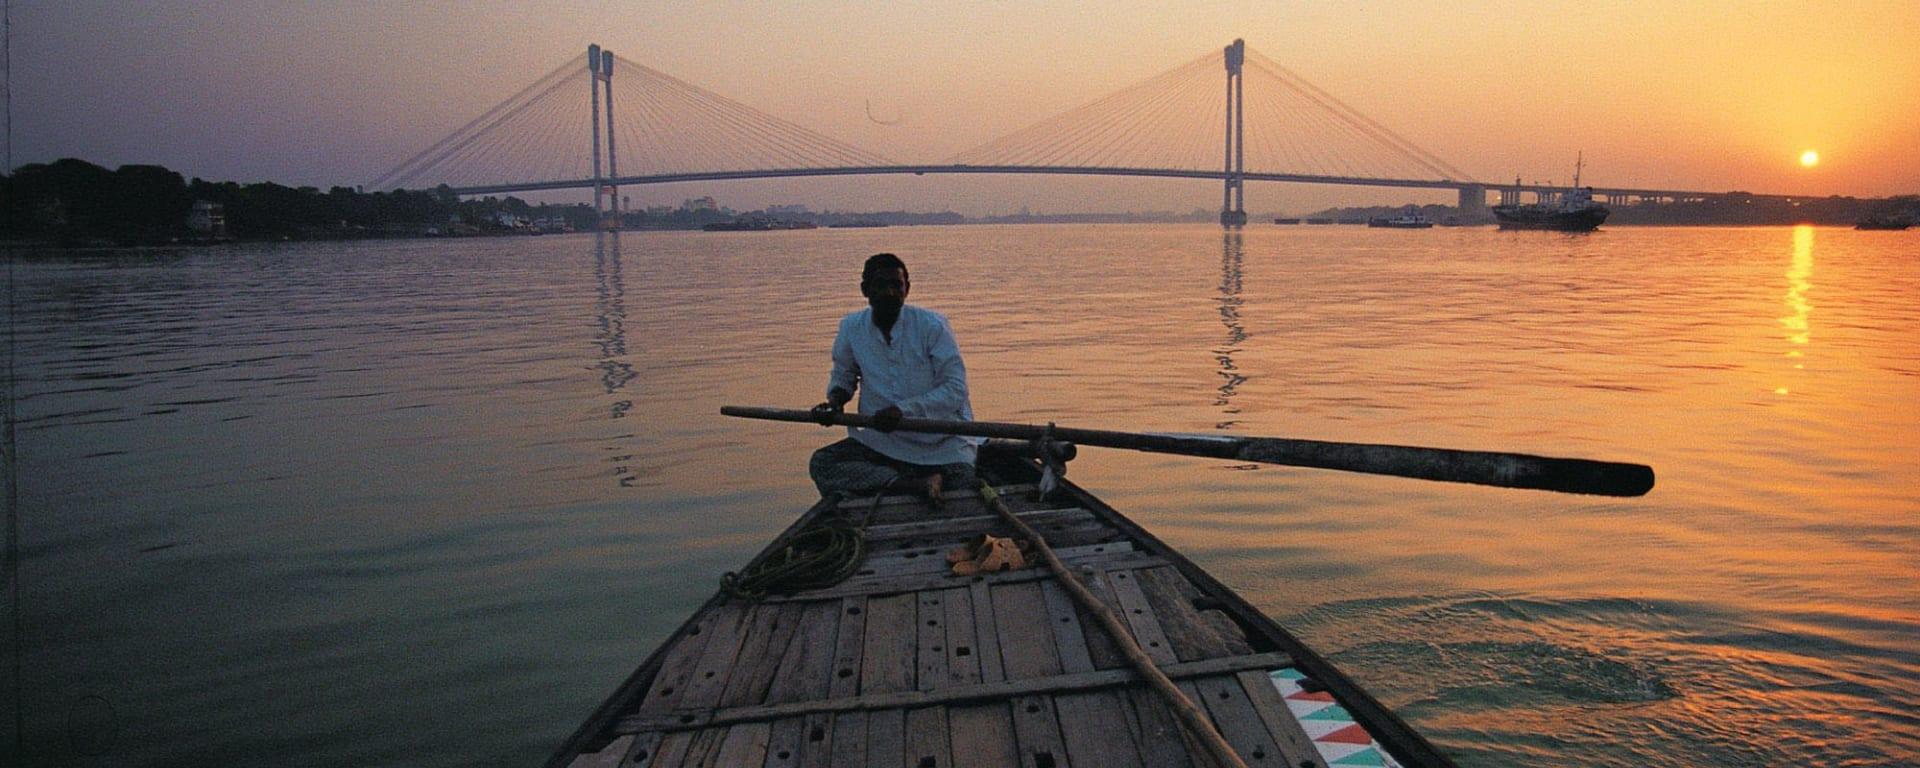 Coucher du soleil sur la rivière Hooghly à Kolkata: Kolkata Hooghly River